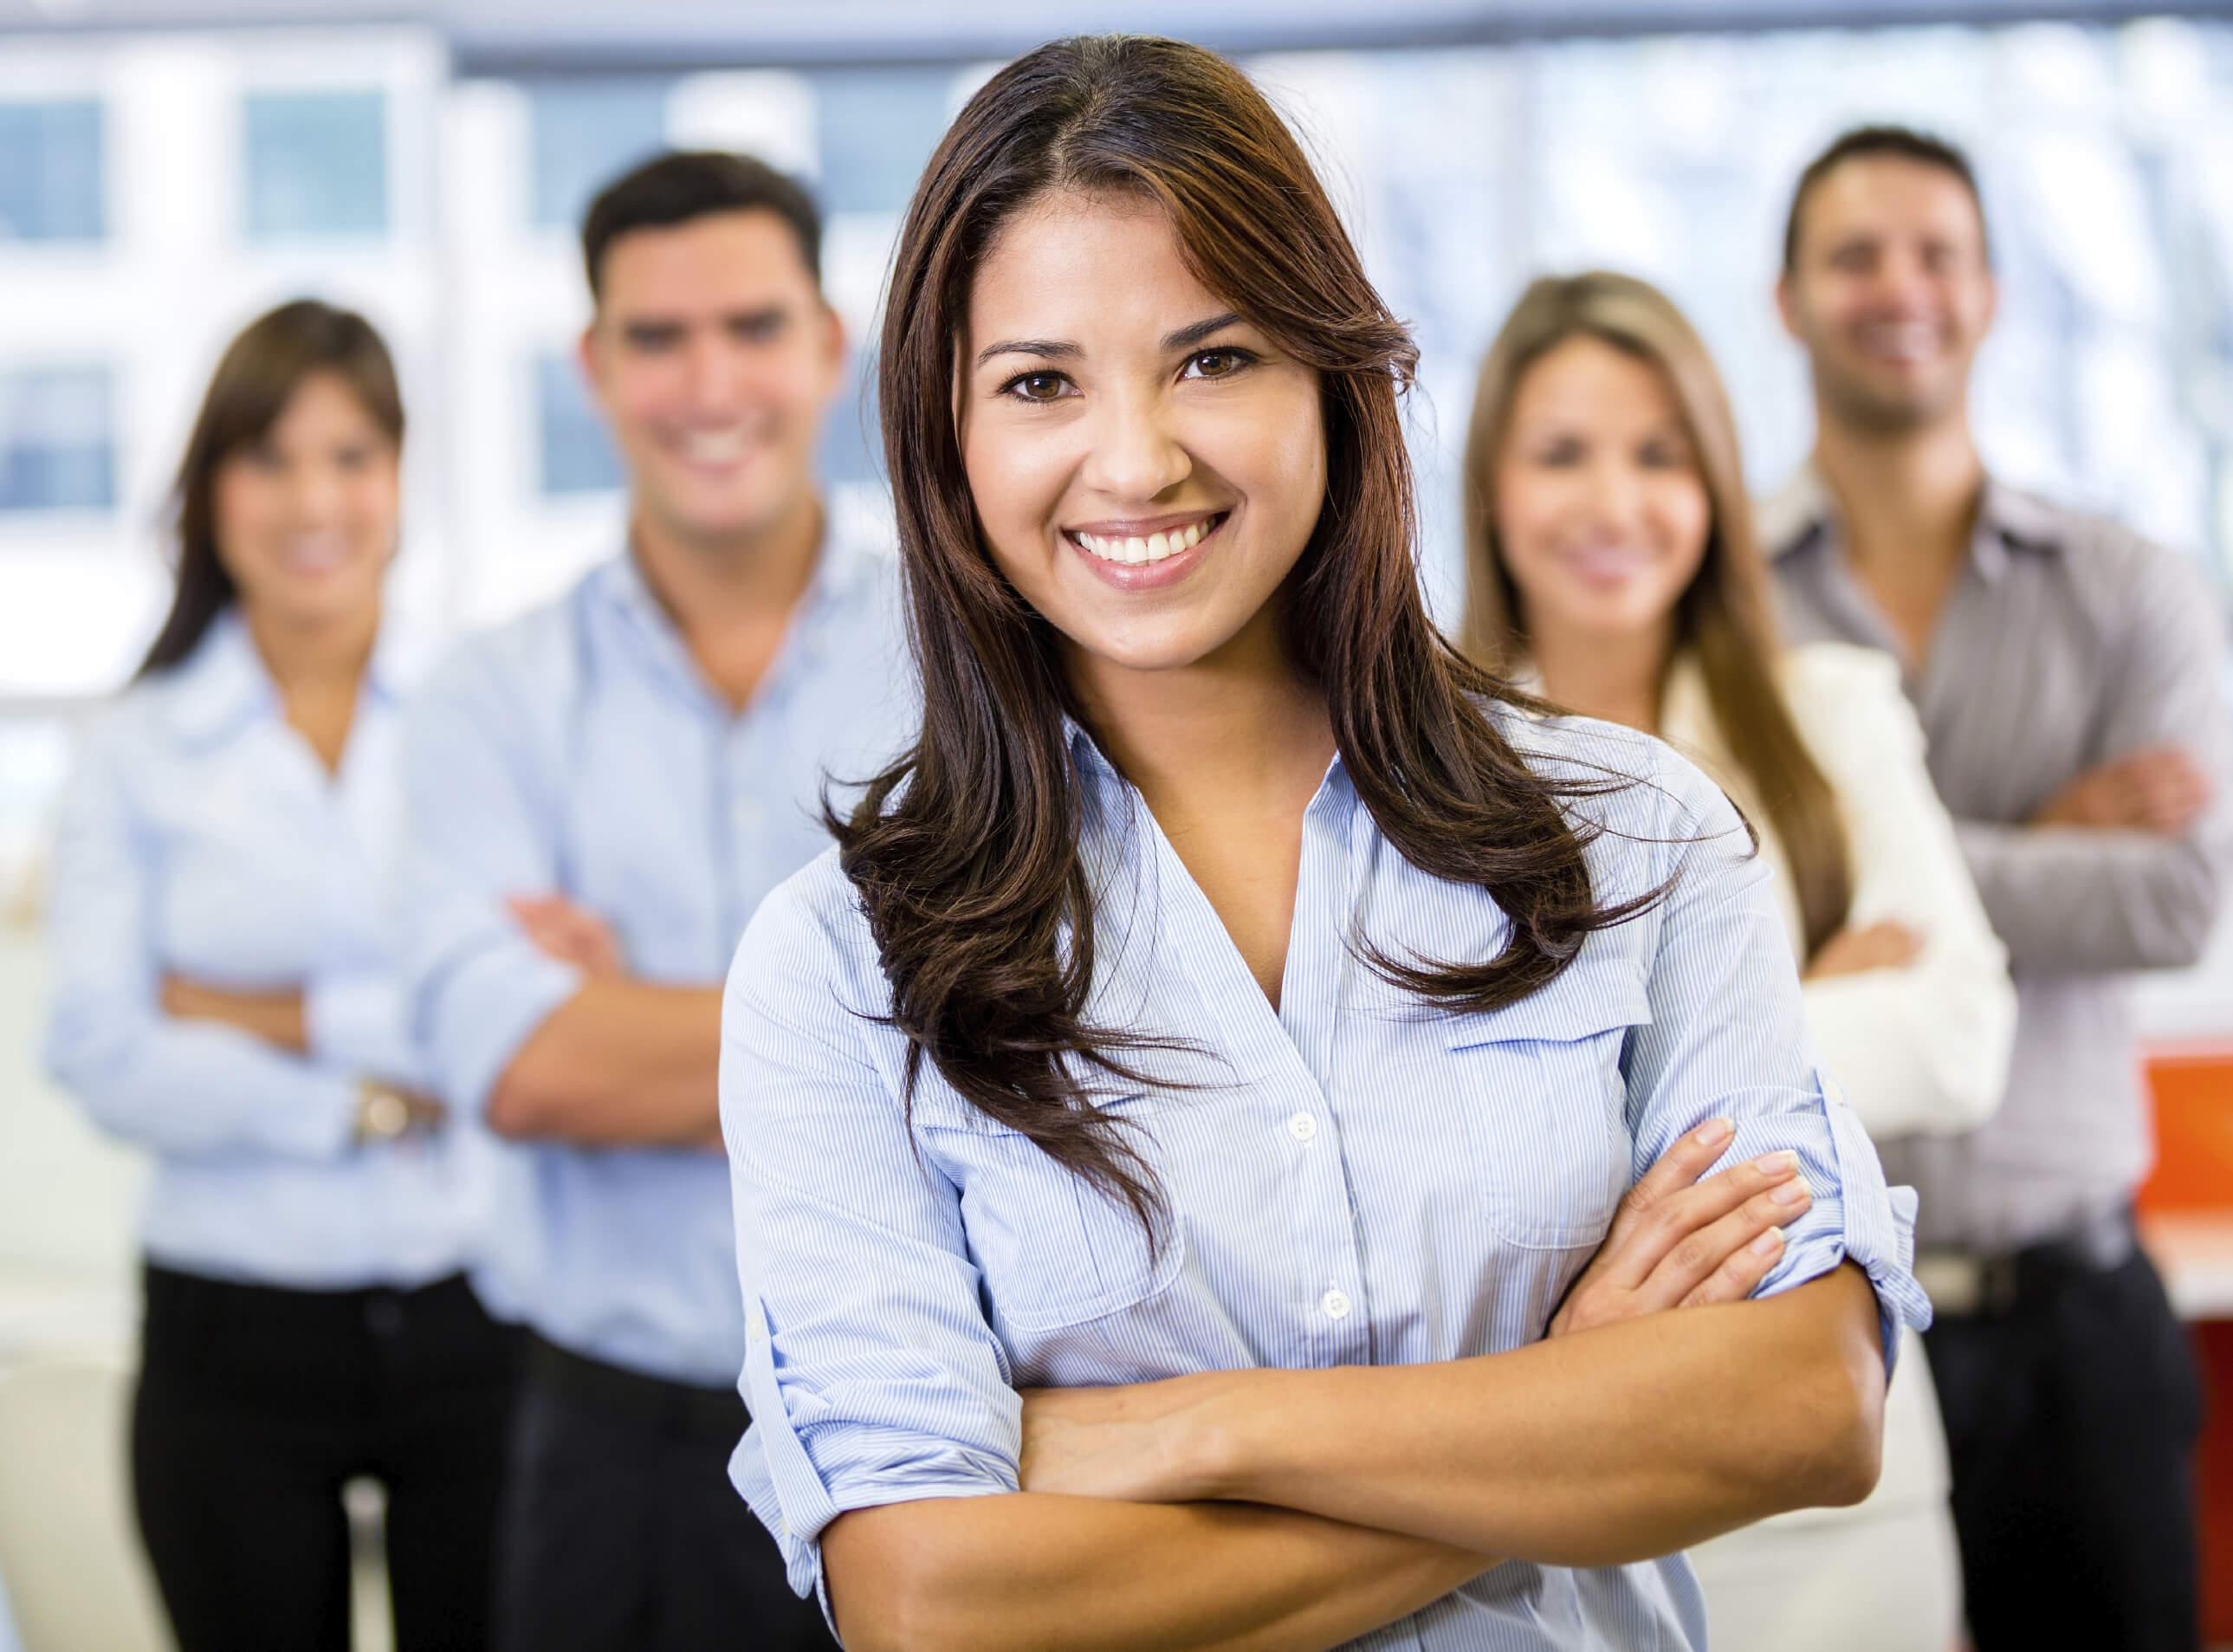 Businesswoman-leading-a-team